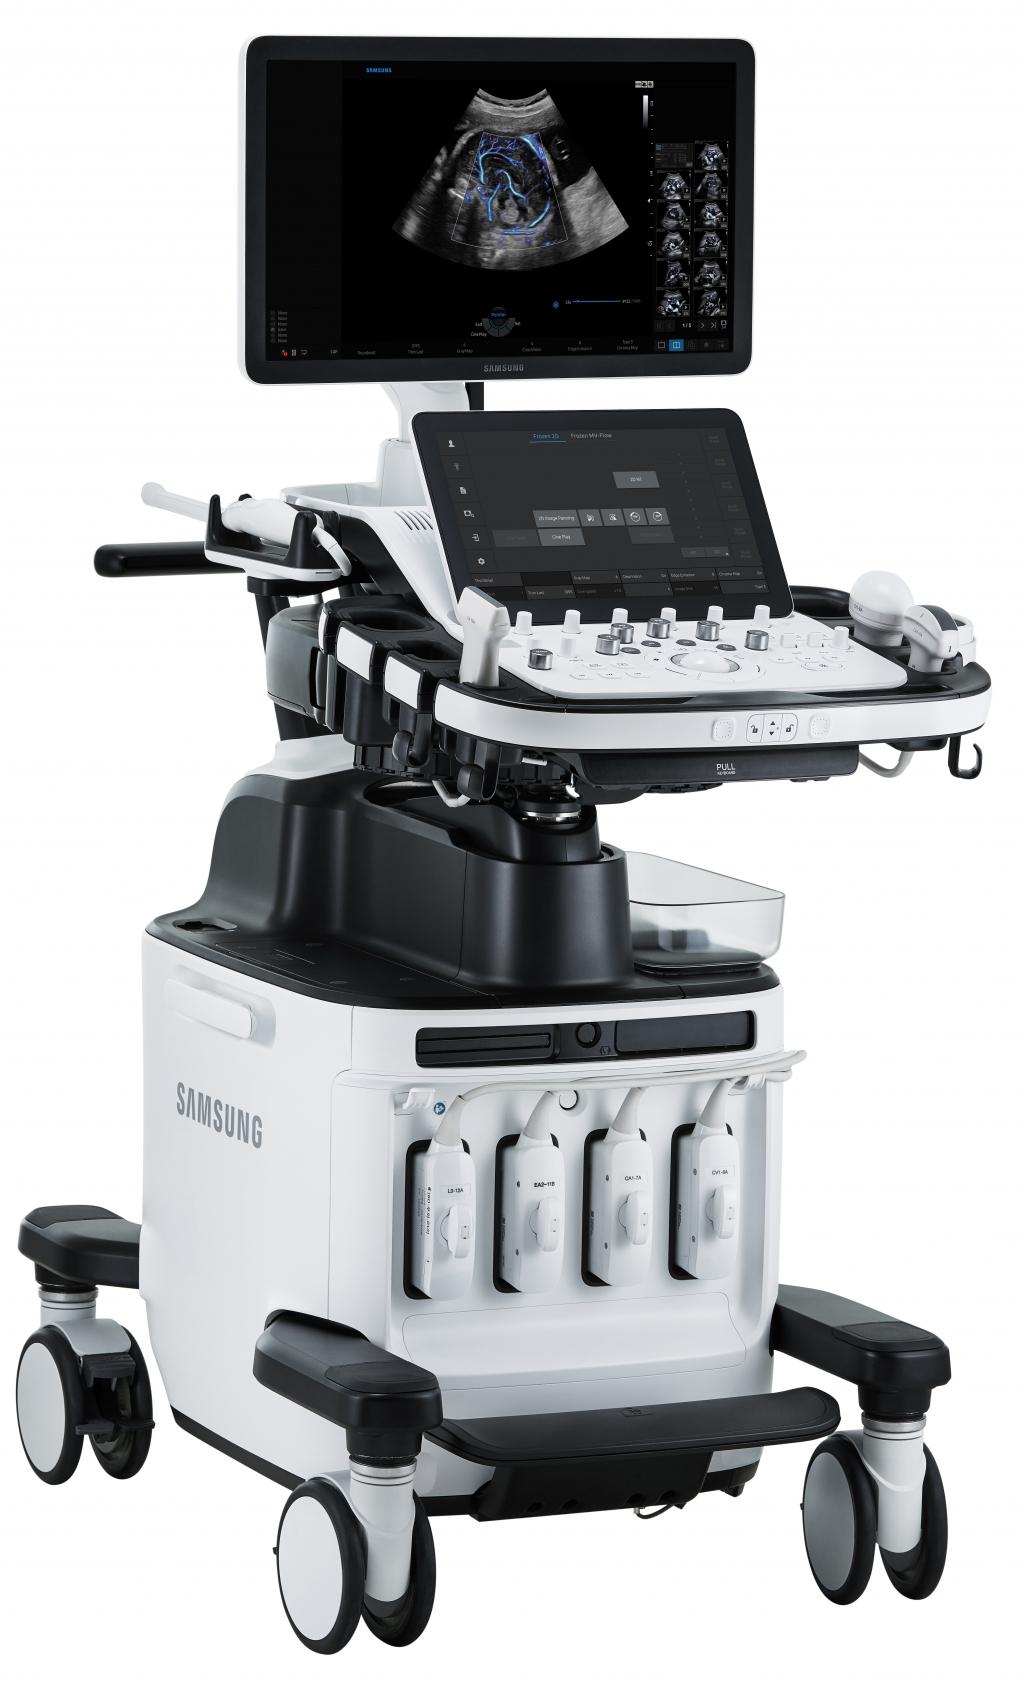 Samsung Unveils a New Ultrasound System 'HERA W10' Powered by Beamforming Technology at ISUOG World Congress 2018